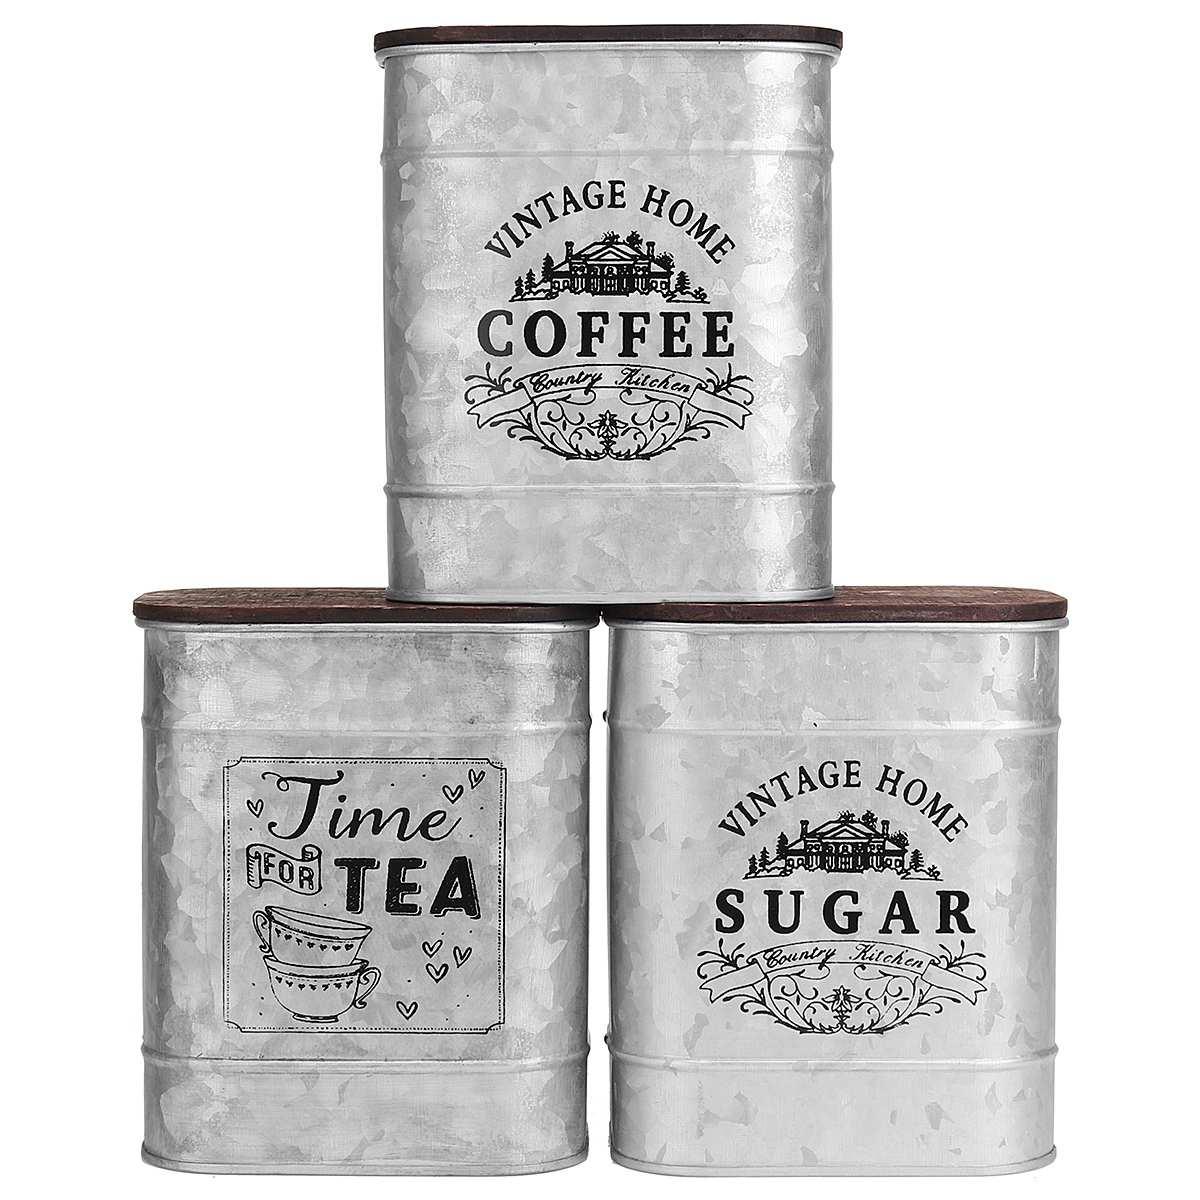 Hermético, sellado, Café en lata, contenedor de harina de azúcar, lata, frascos de botellas de almacenamiento para café de grano, tarro de caramelos, caja, contenedor de cocina